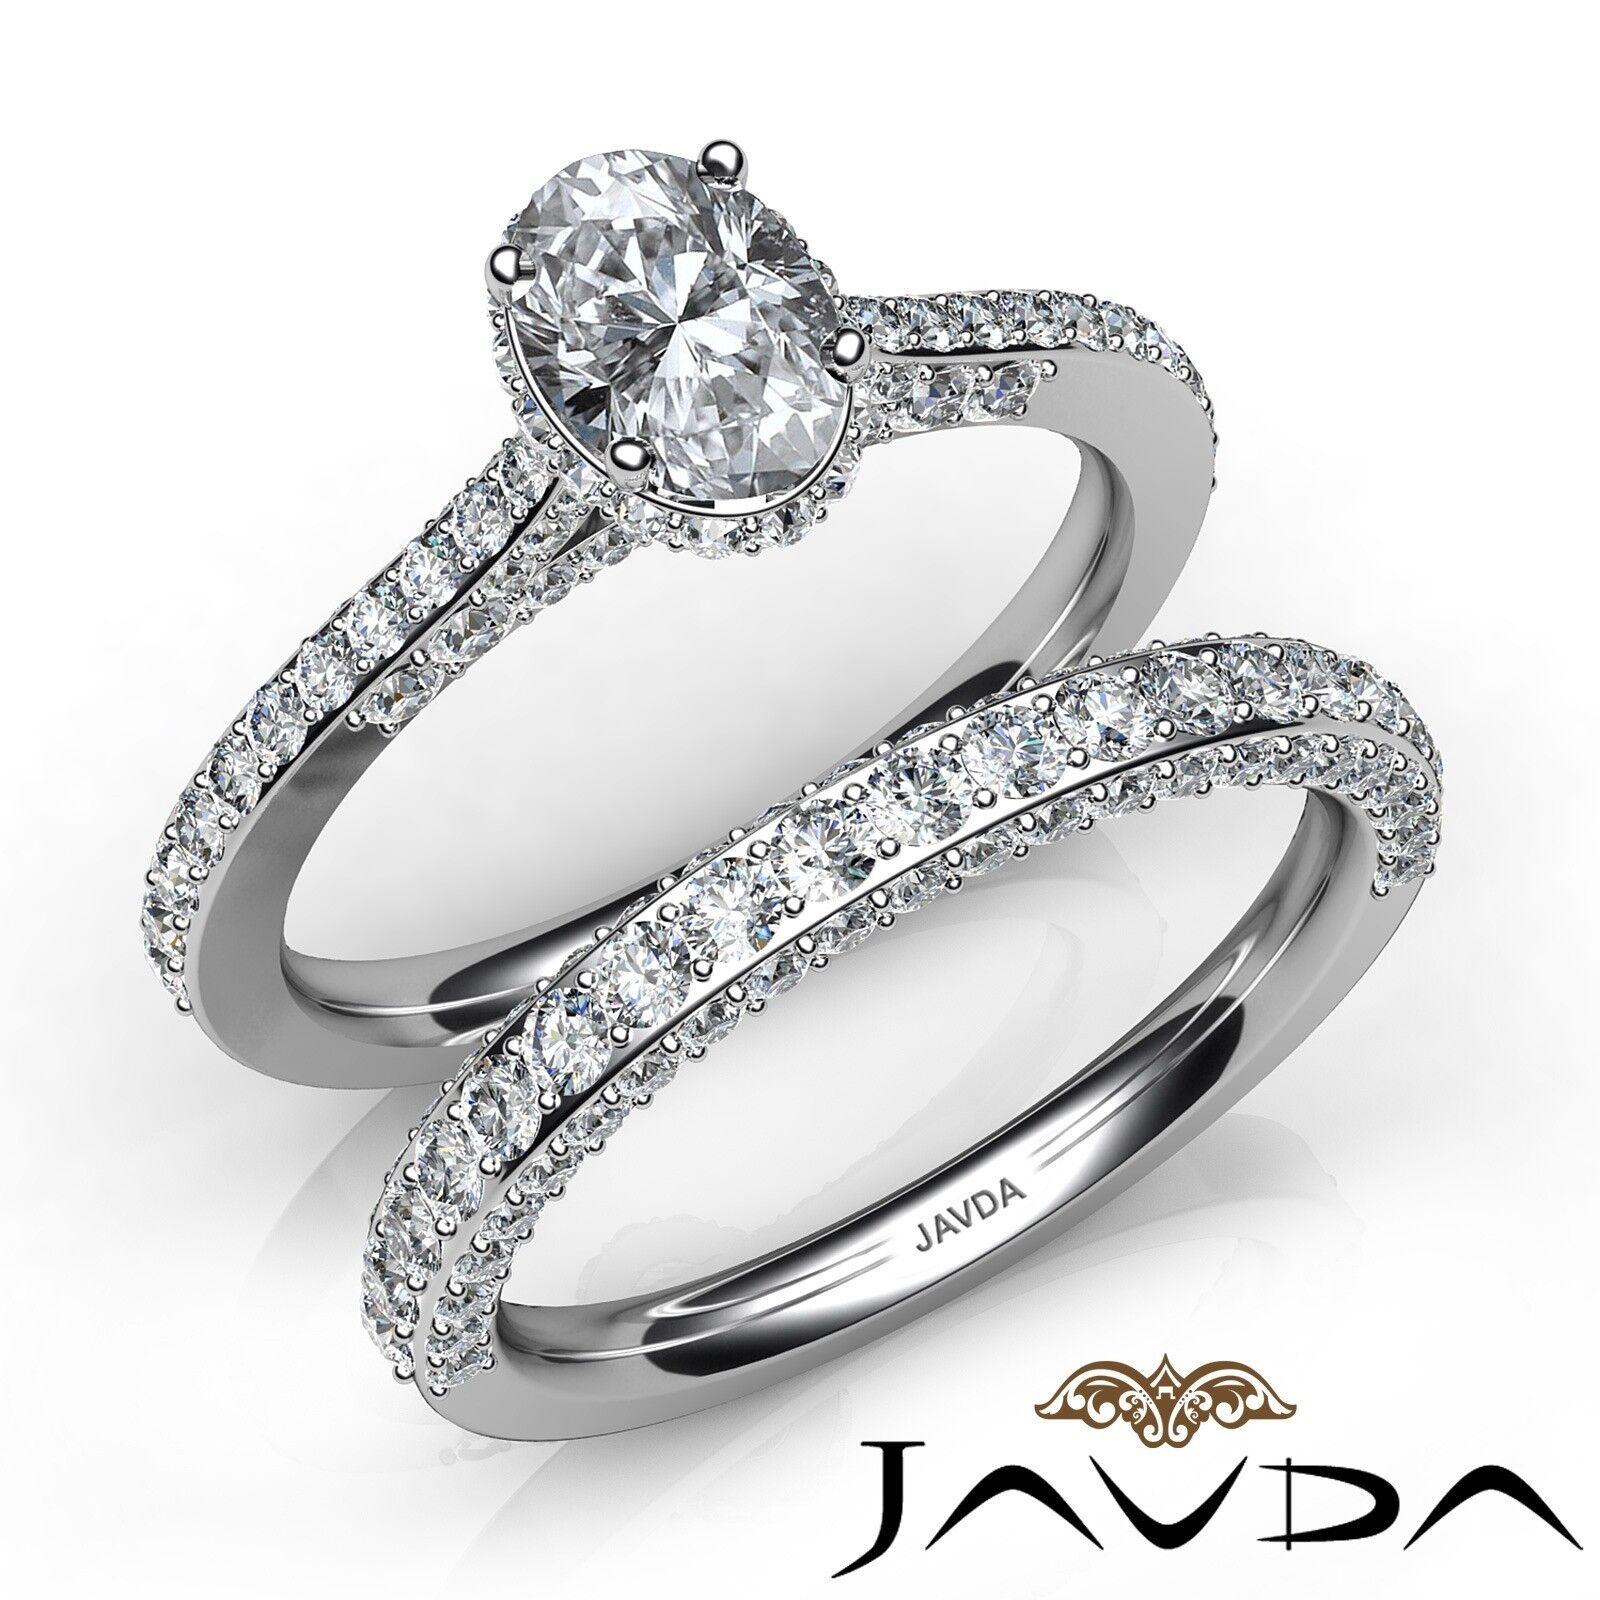 2.46ctw Circa Halo Bridal Set Pave Oval Diamond Engagement Ring GIA H-VS1 W Gold